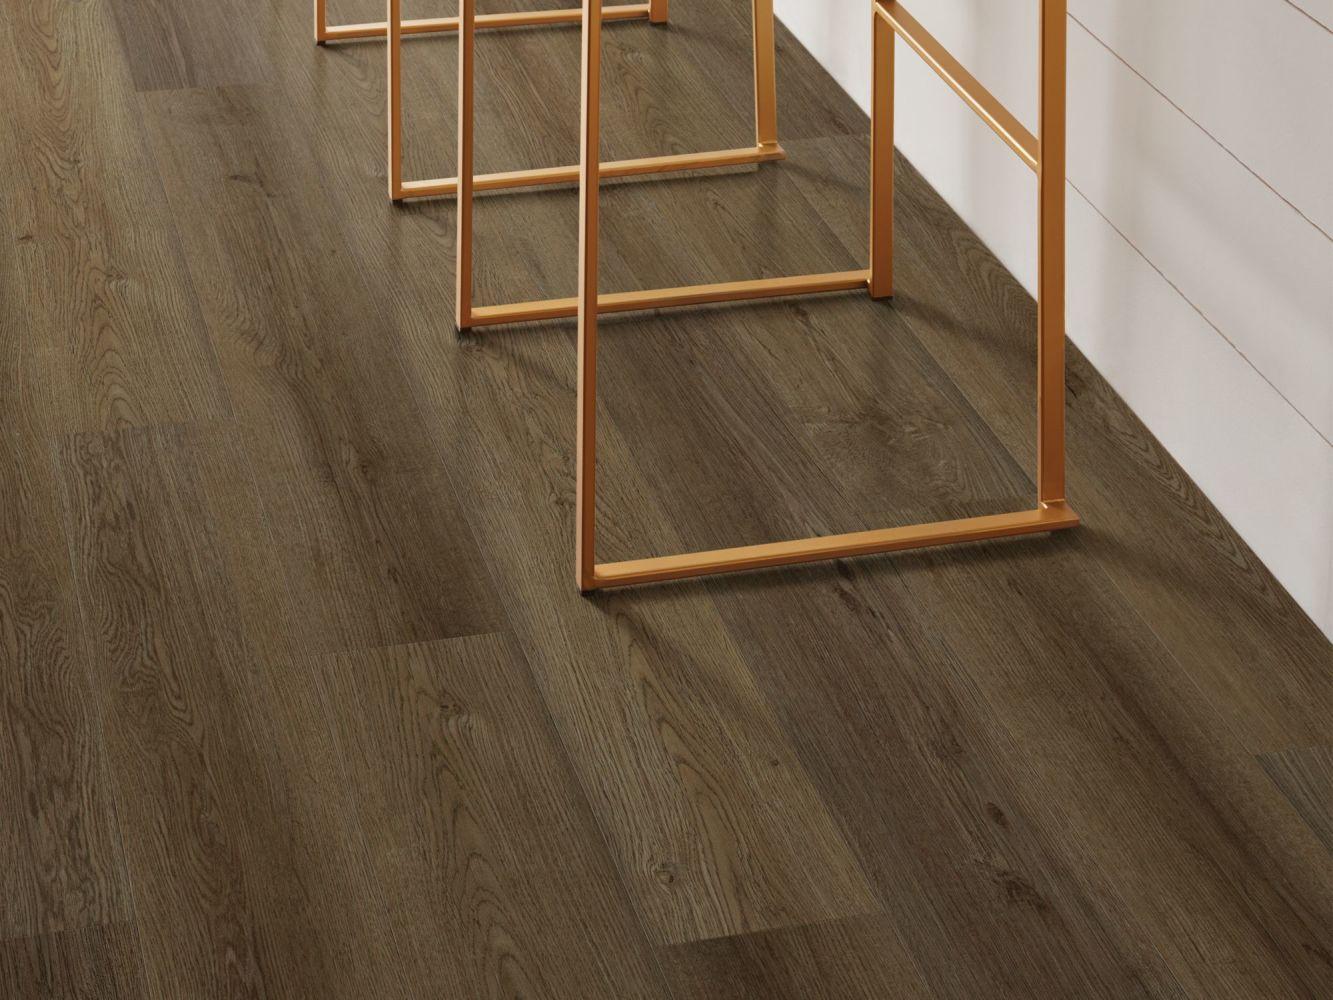 Shaw Floors Resilient Residential Wanderer Raw Sienna 00825_3053V